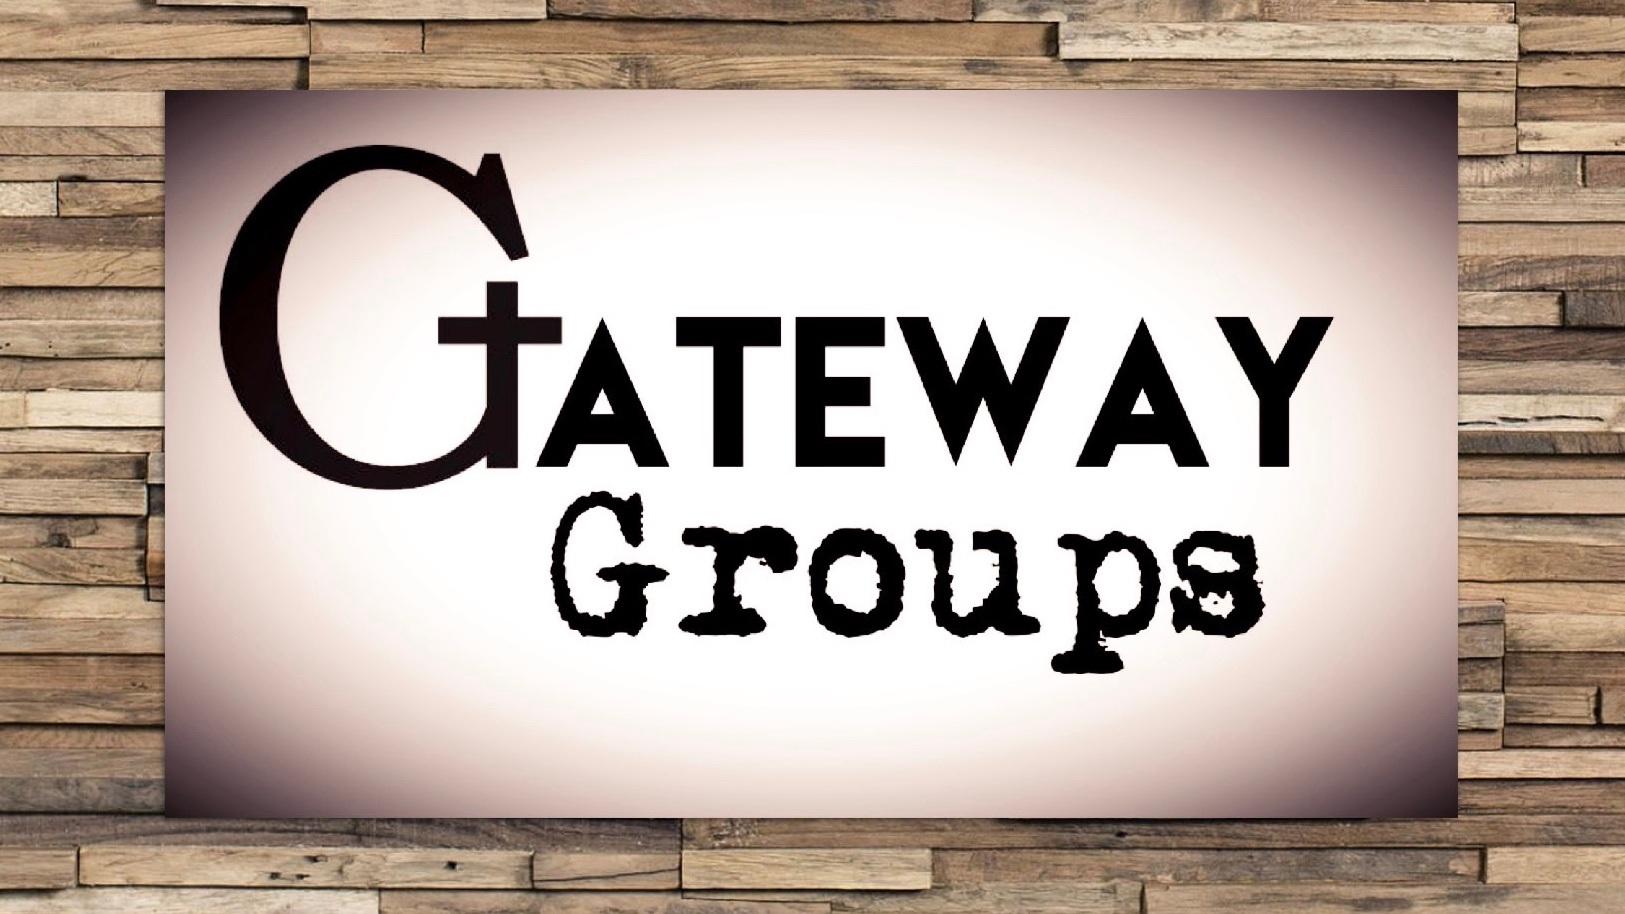 GatewayGroups16X9.jpg